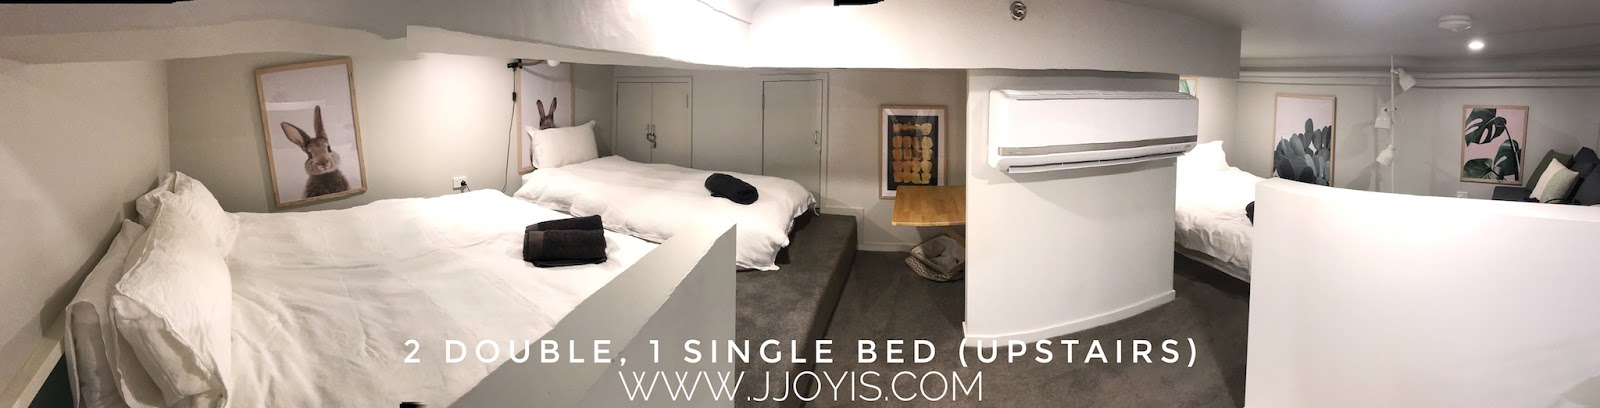 Airbnb for large groups (sleep 7) in Brisbane CBD loft